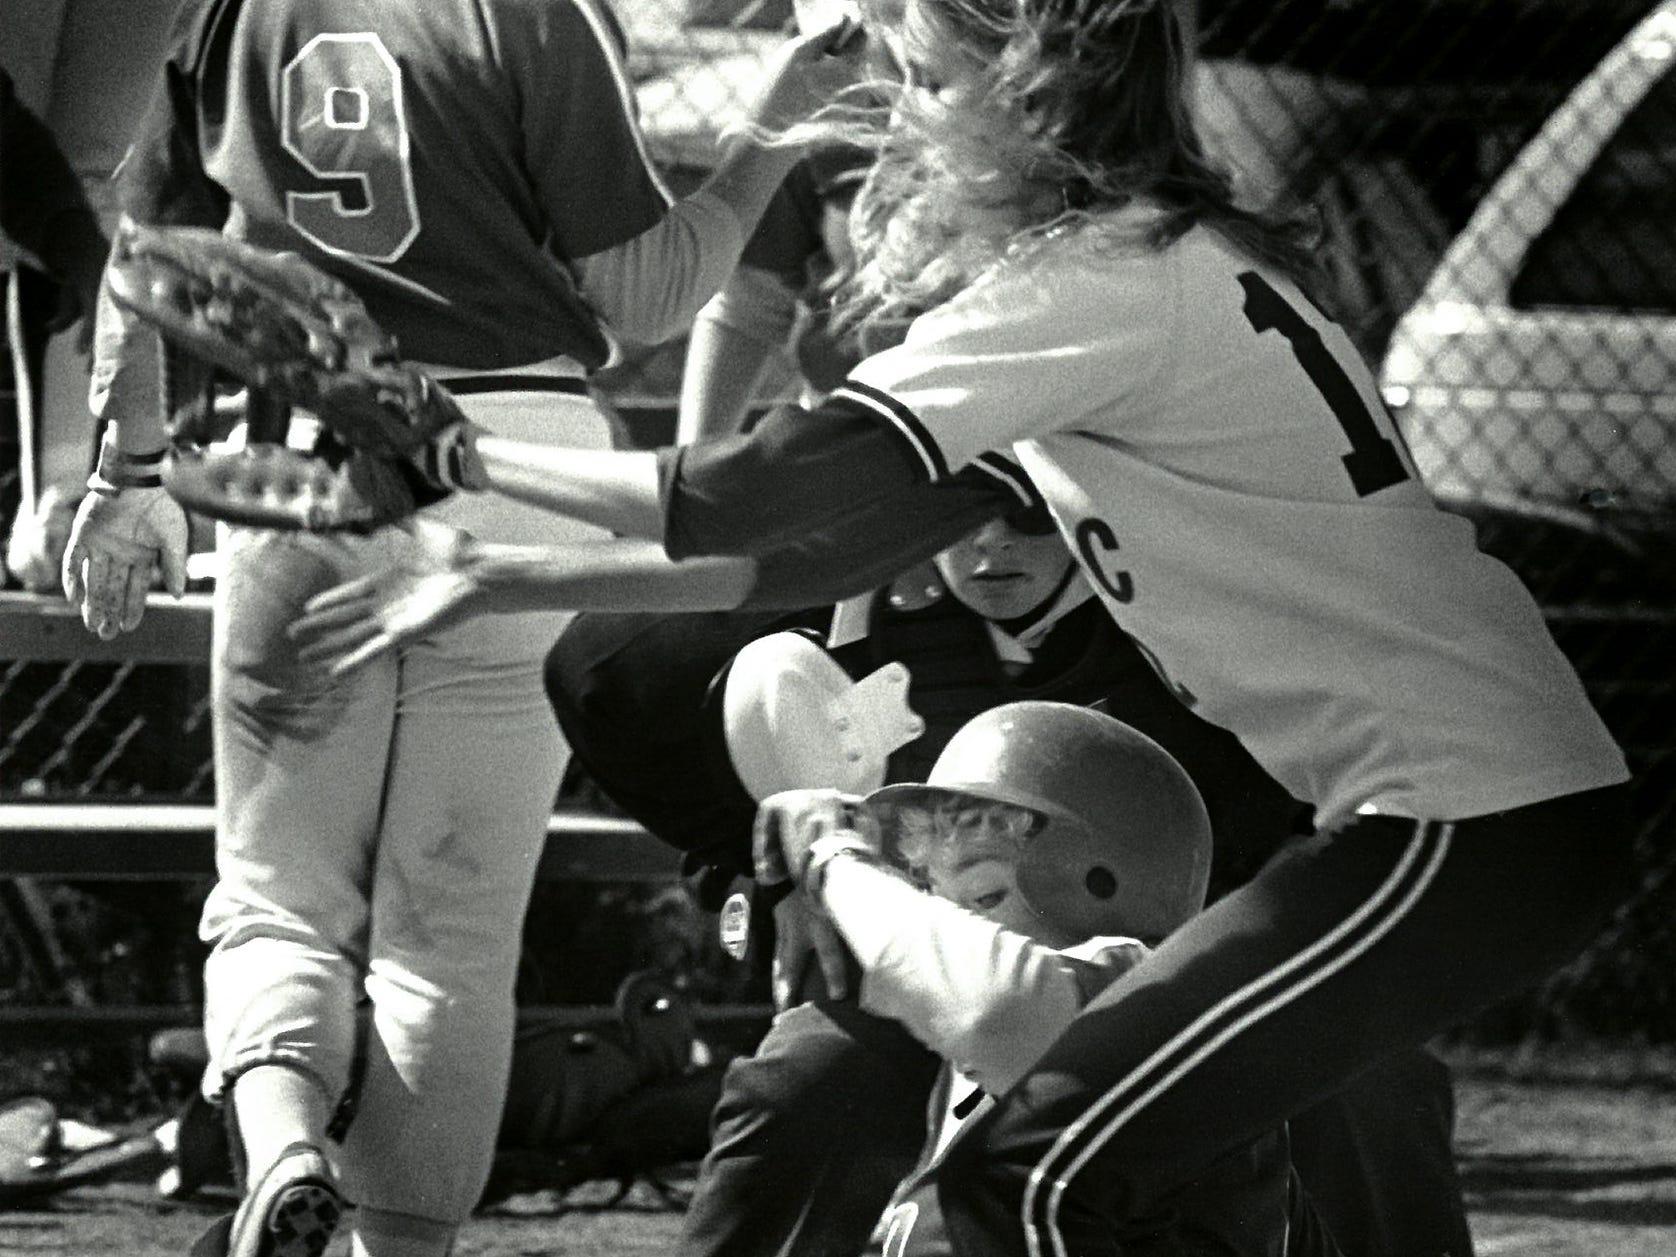 1988Green River vs OC Softball